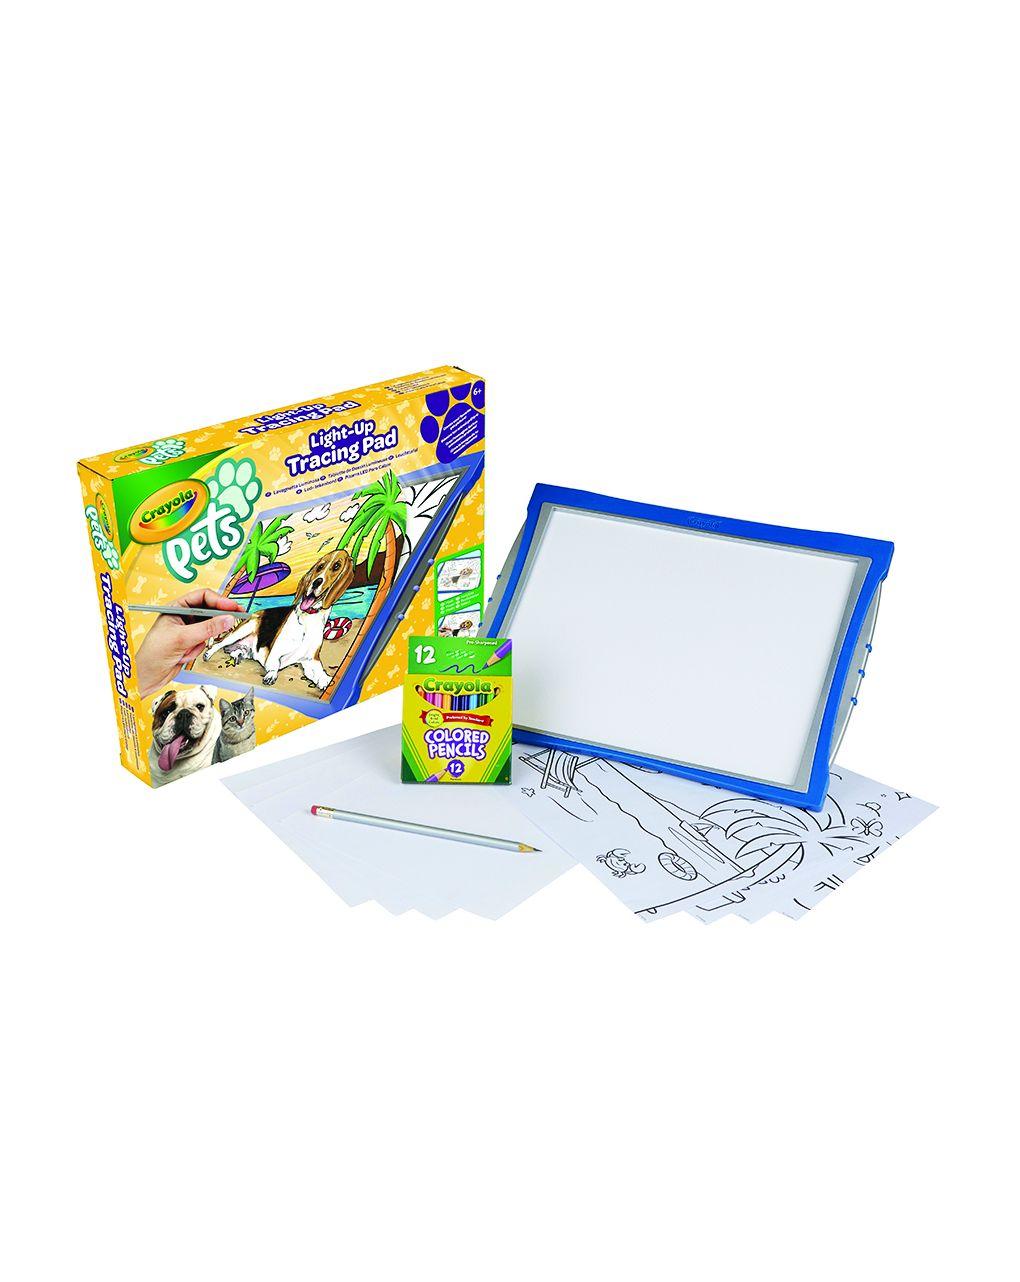 Crayola - pets lavagnetta luminosa - Crayola